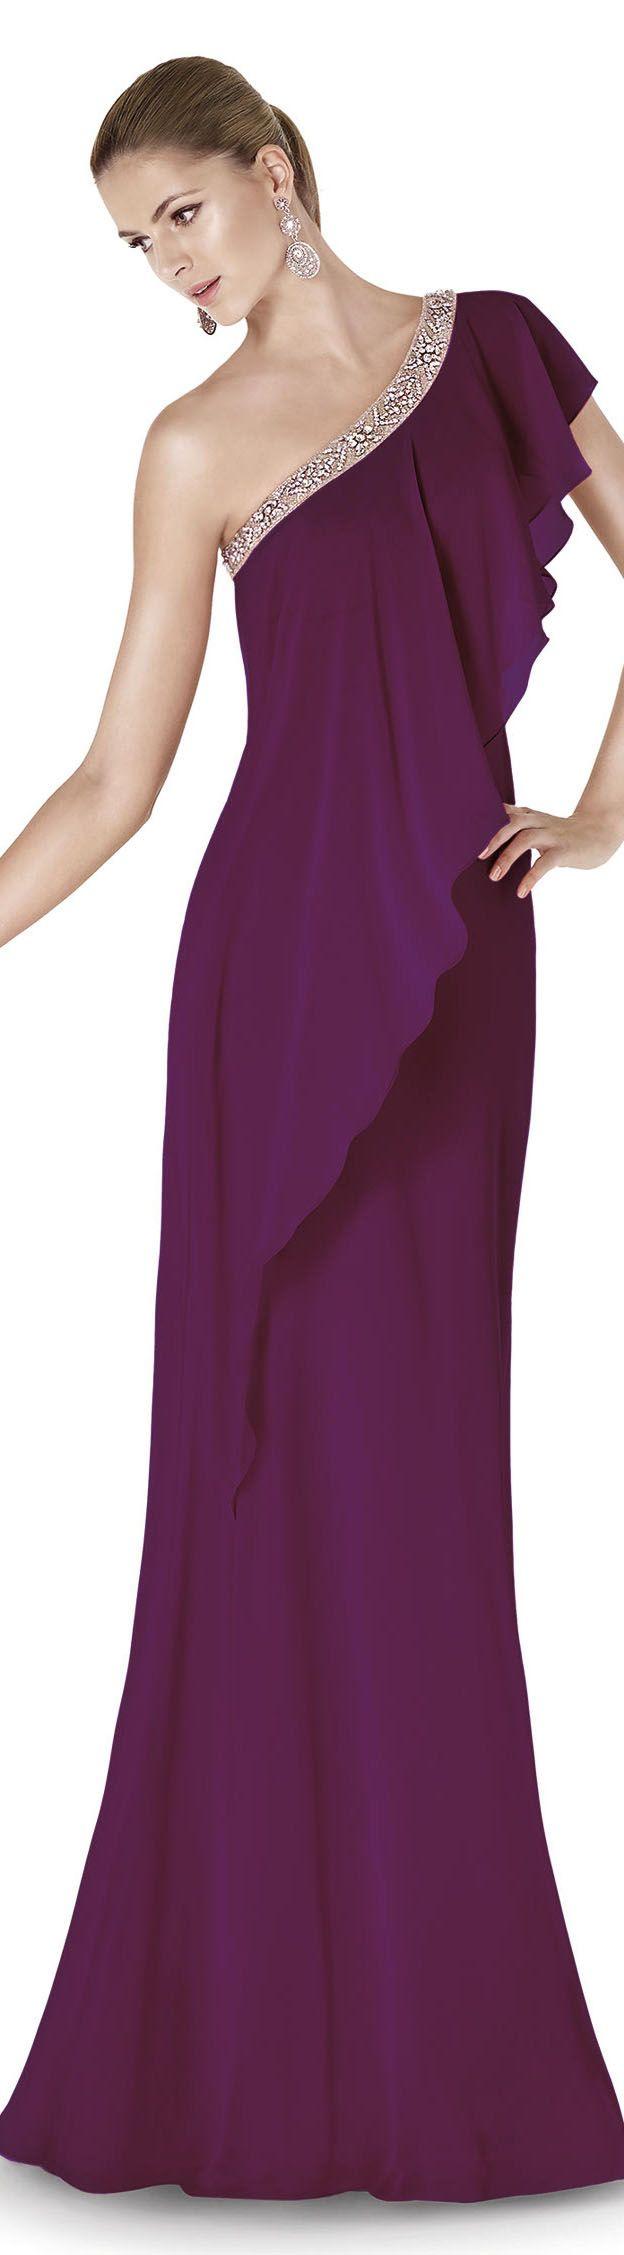 Pronovias 2015 Cocktail Dress Collection   Vestidos   Pinterest ...